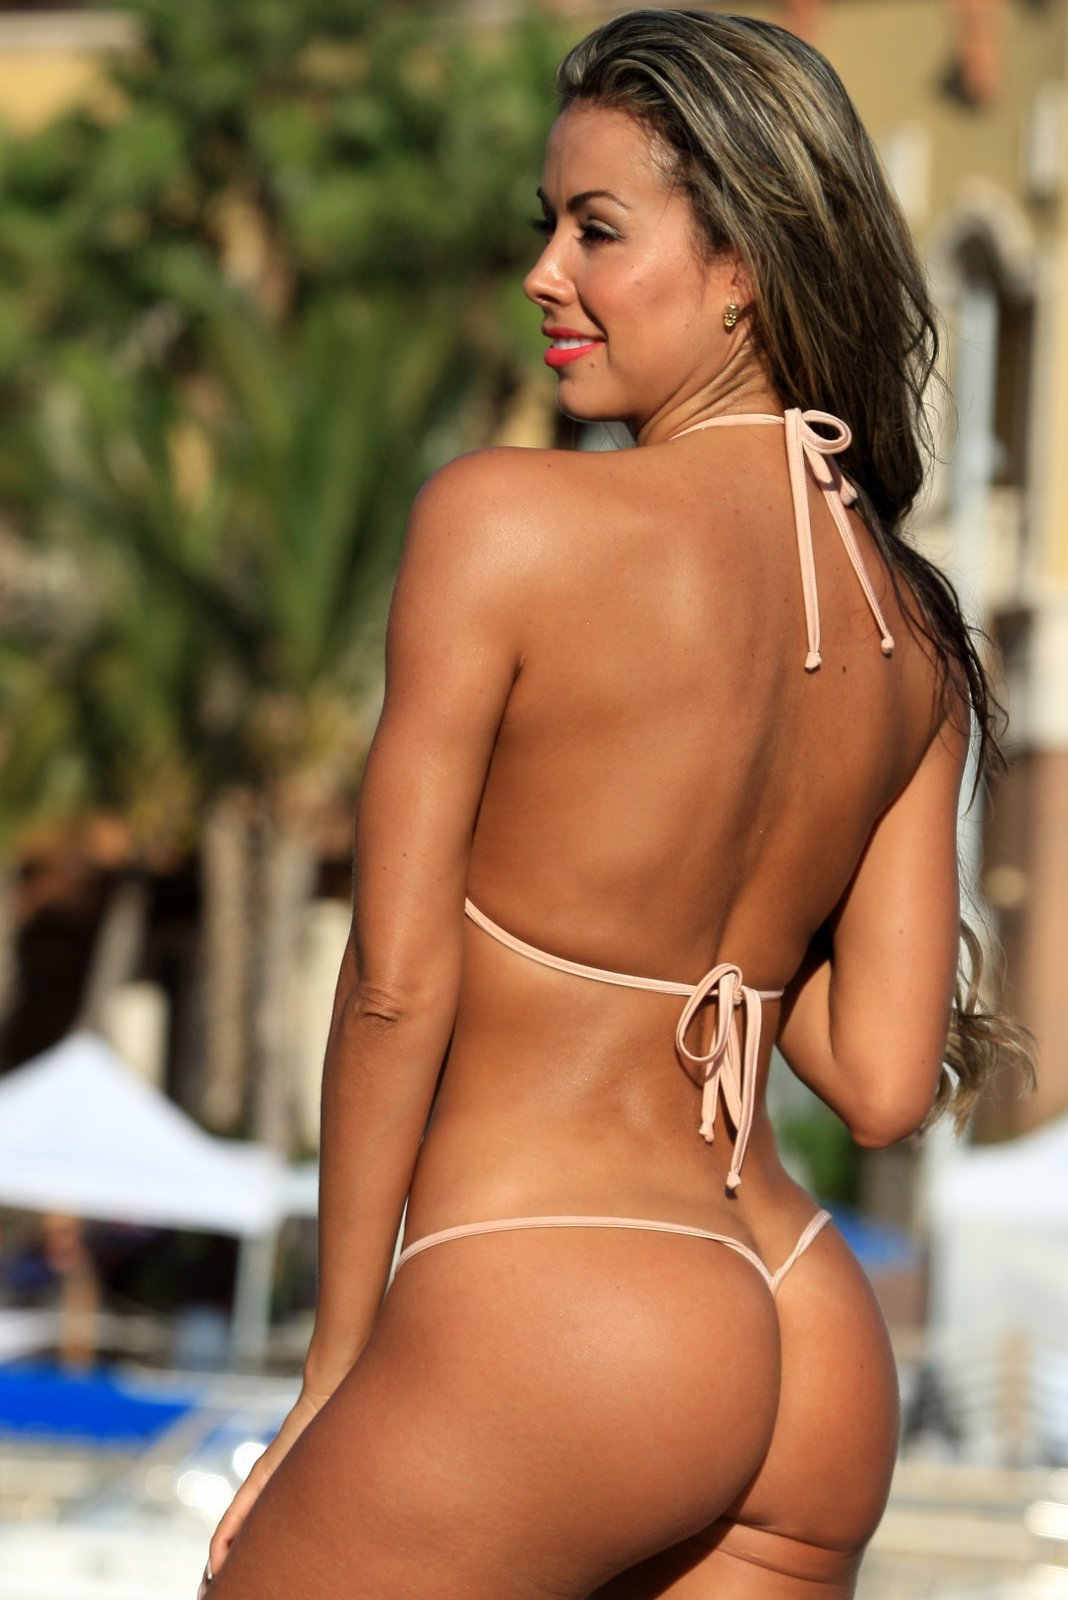 17cd18cbf7f Teeny G String Bikini - Made in USA by UjENA Swimwear